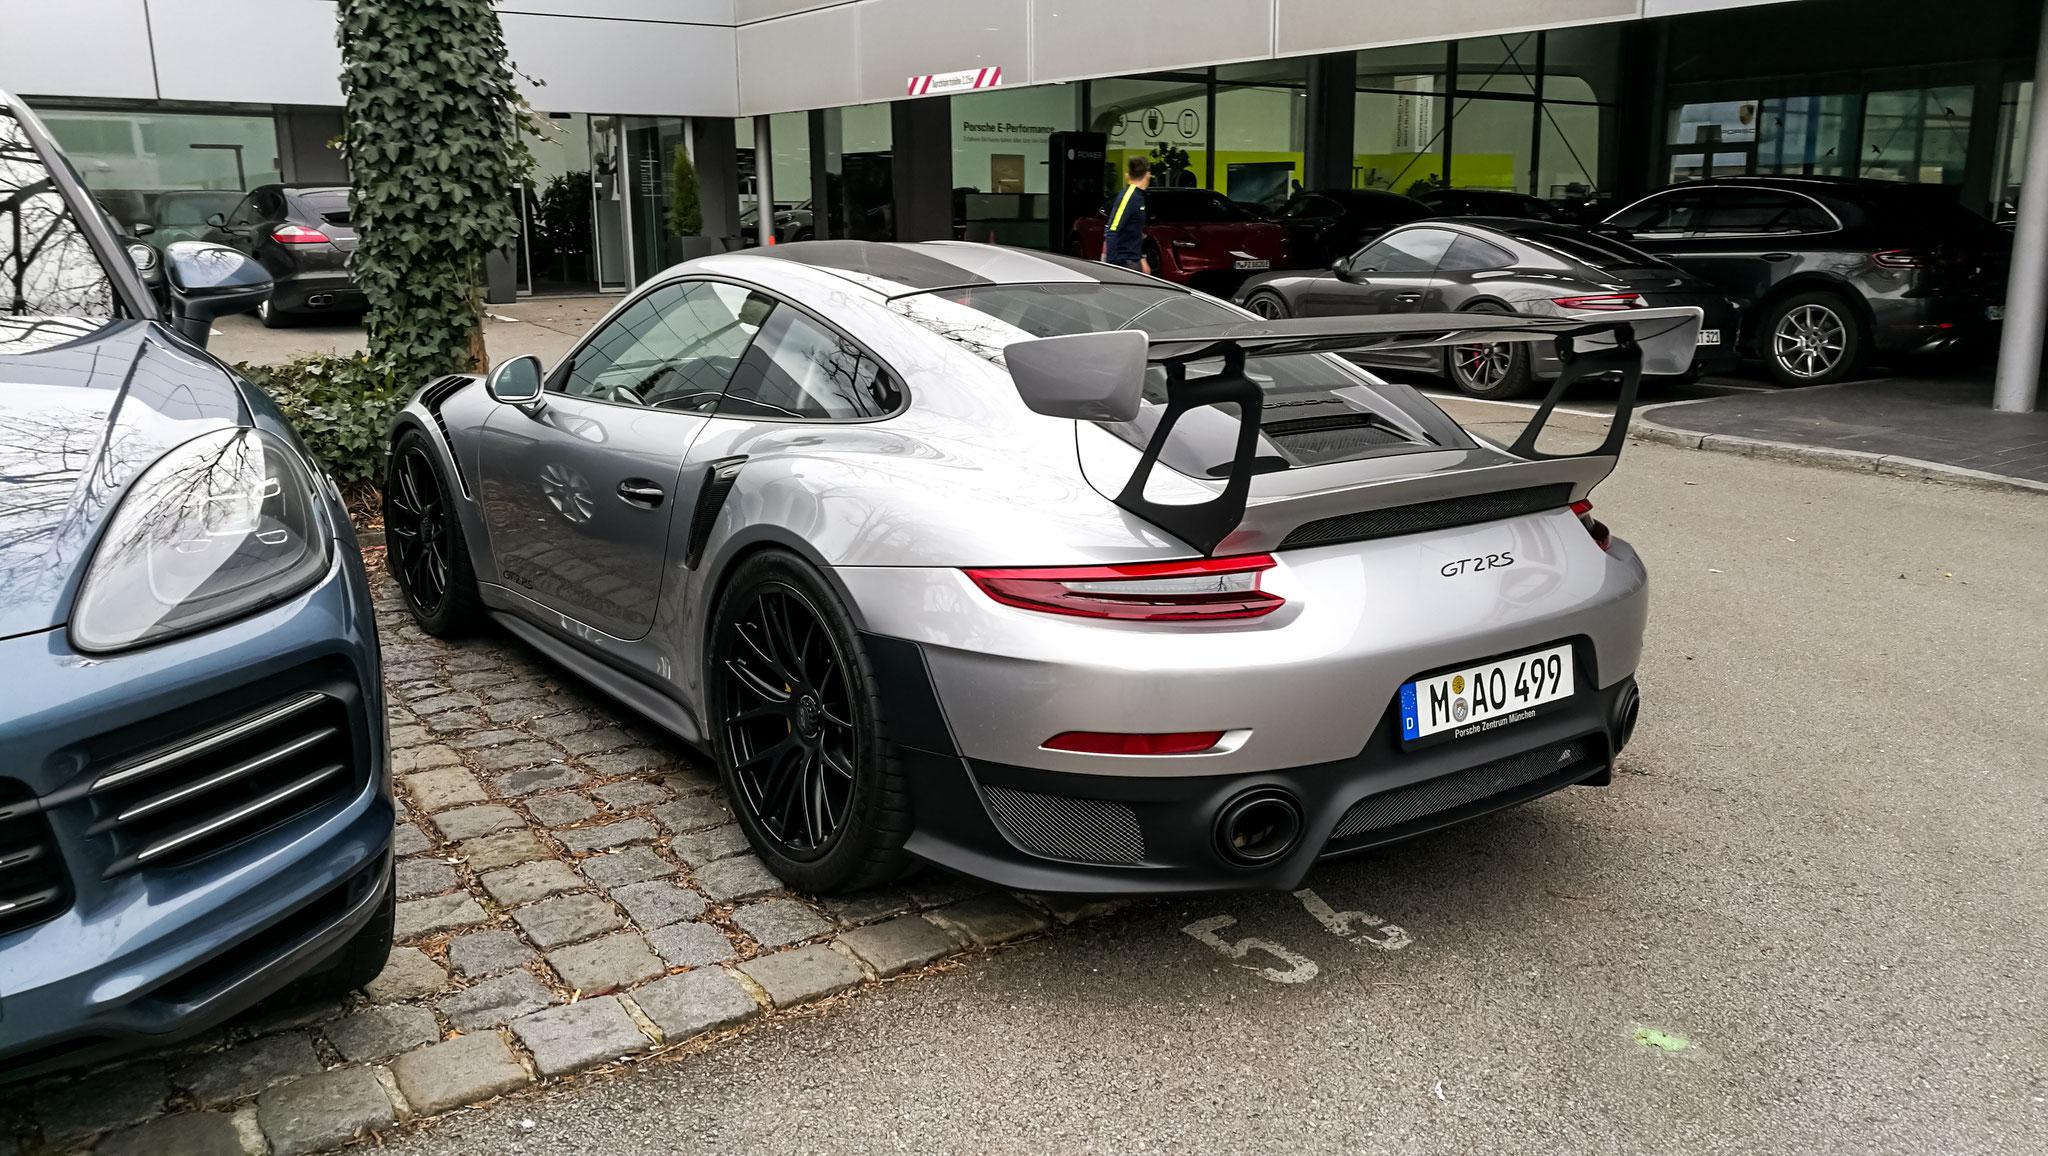 Porsche GT2 RS - M-AO-499